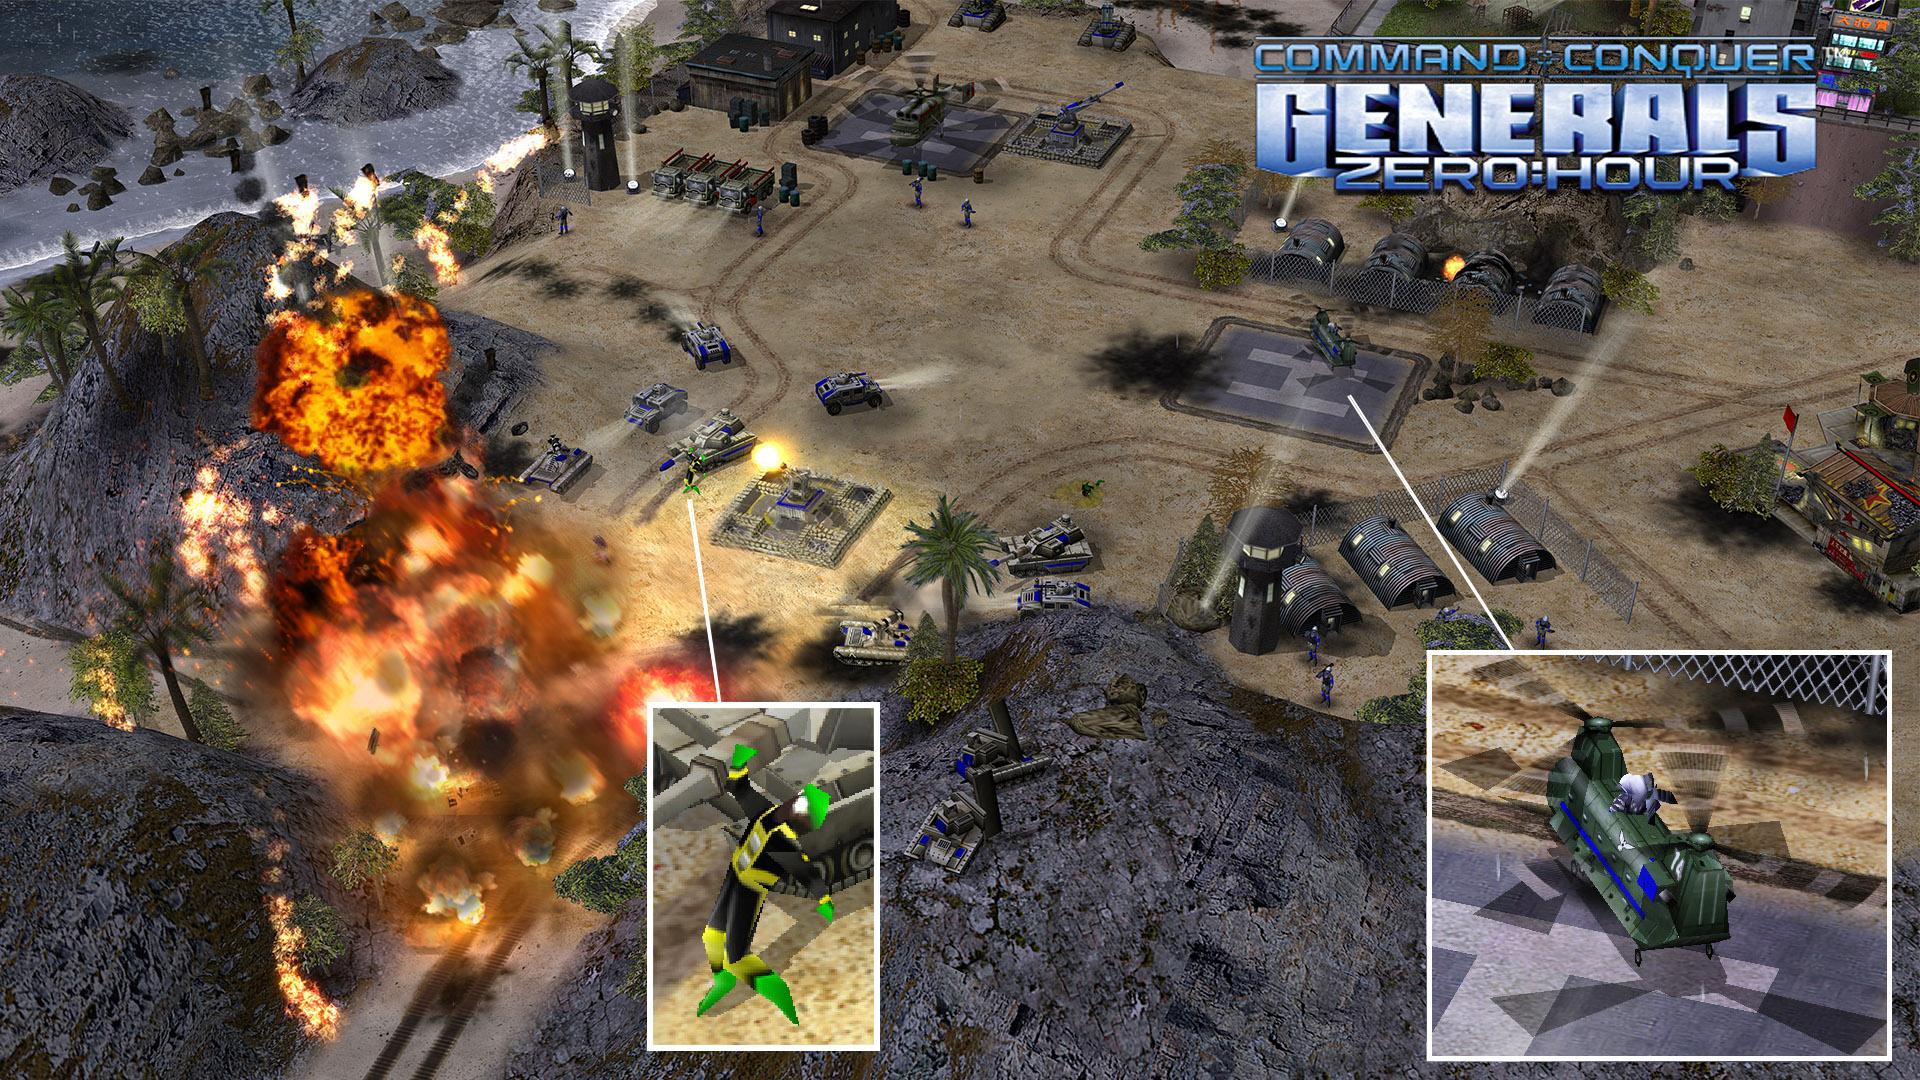 Command & Conquer: Generals – Zero Hour Download - Old Games Download